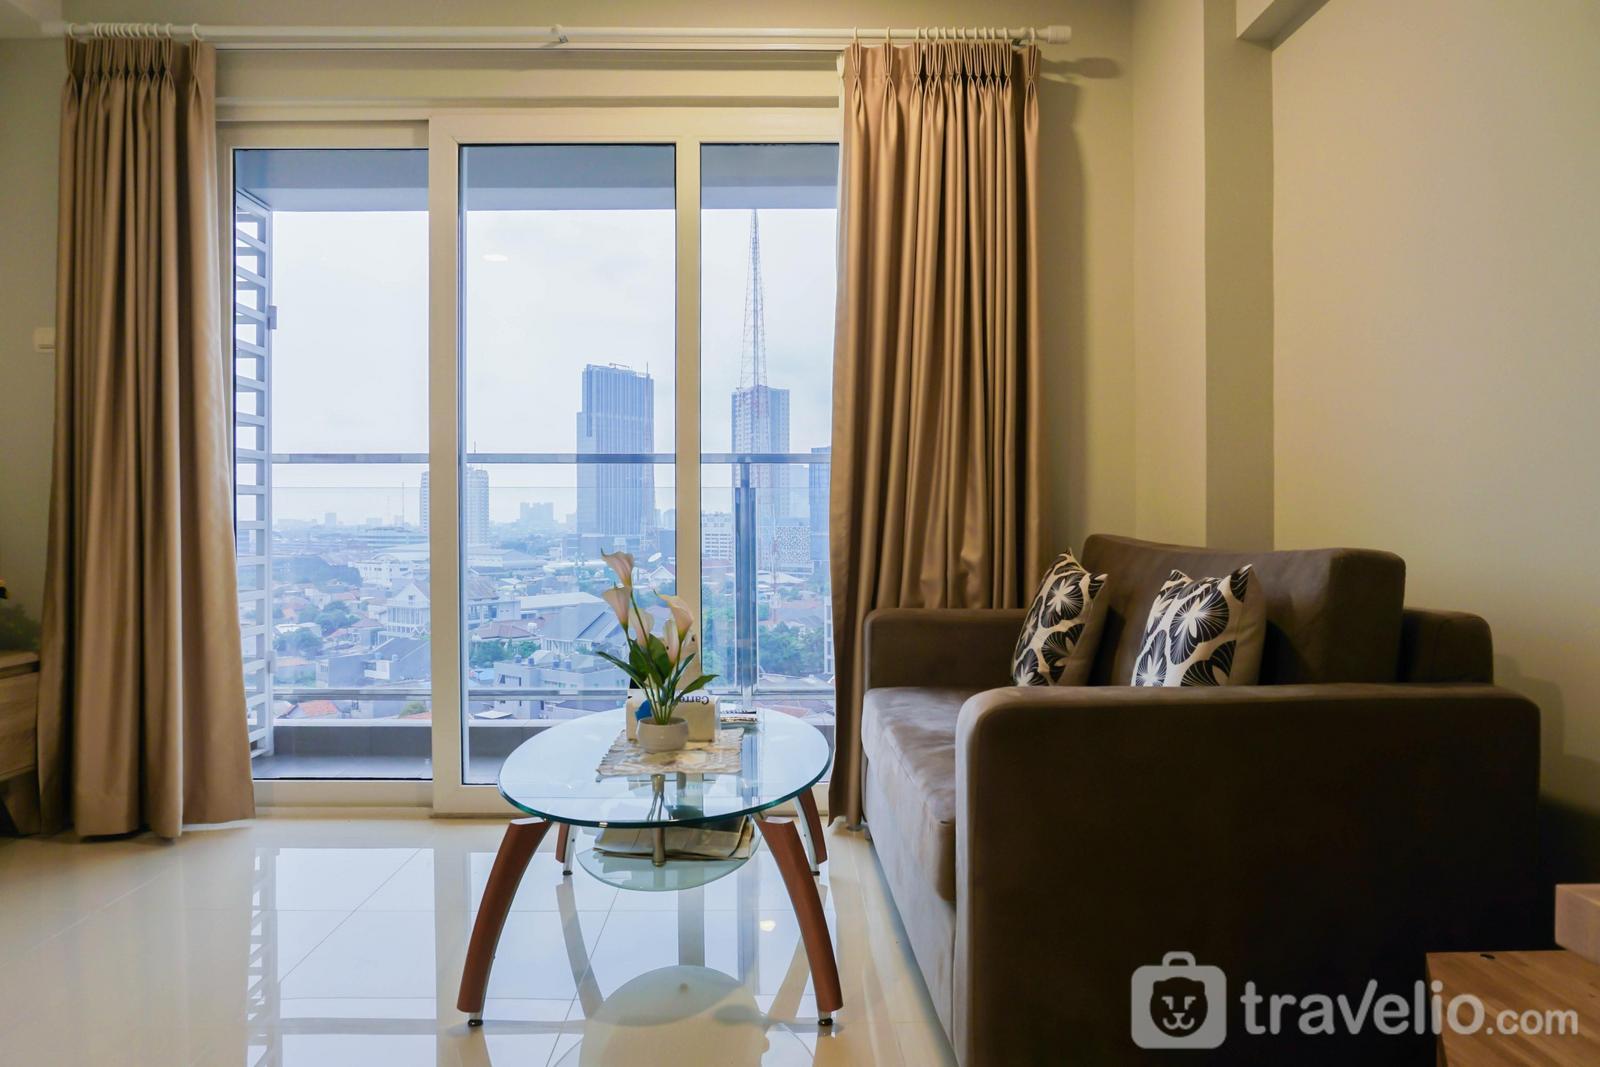 Apartemen Maqna Residence - Modern 2BR Apartment at Maqna Residence By Travelio